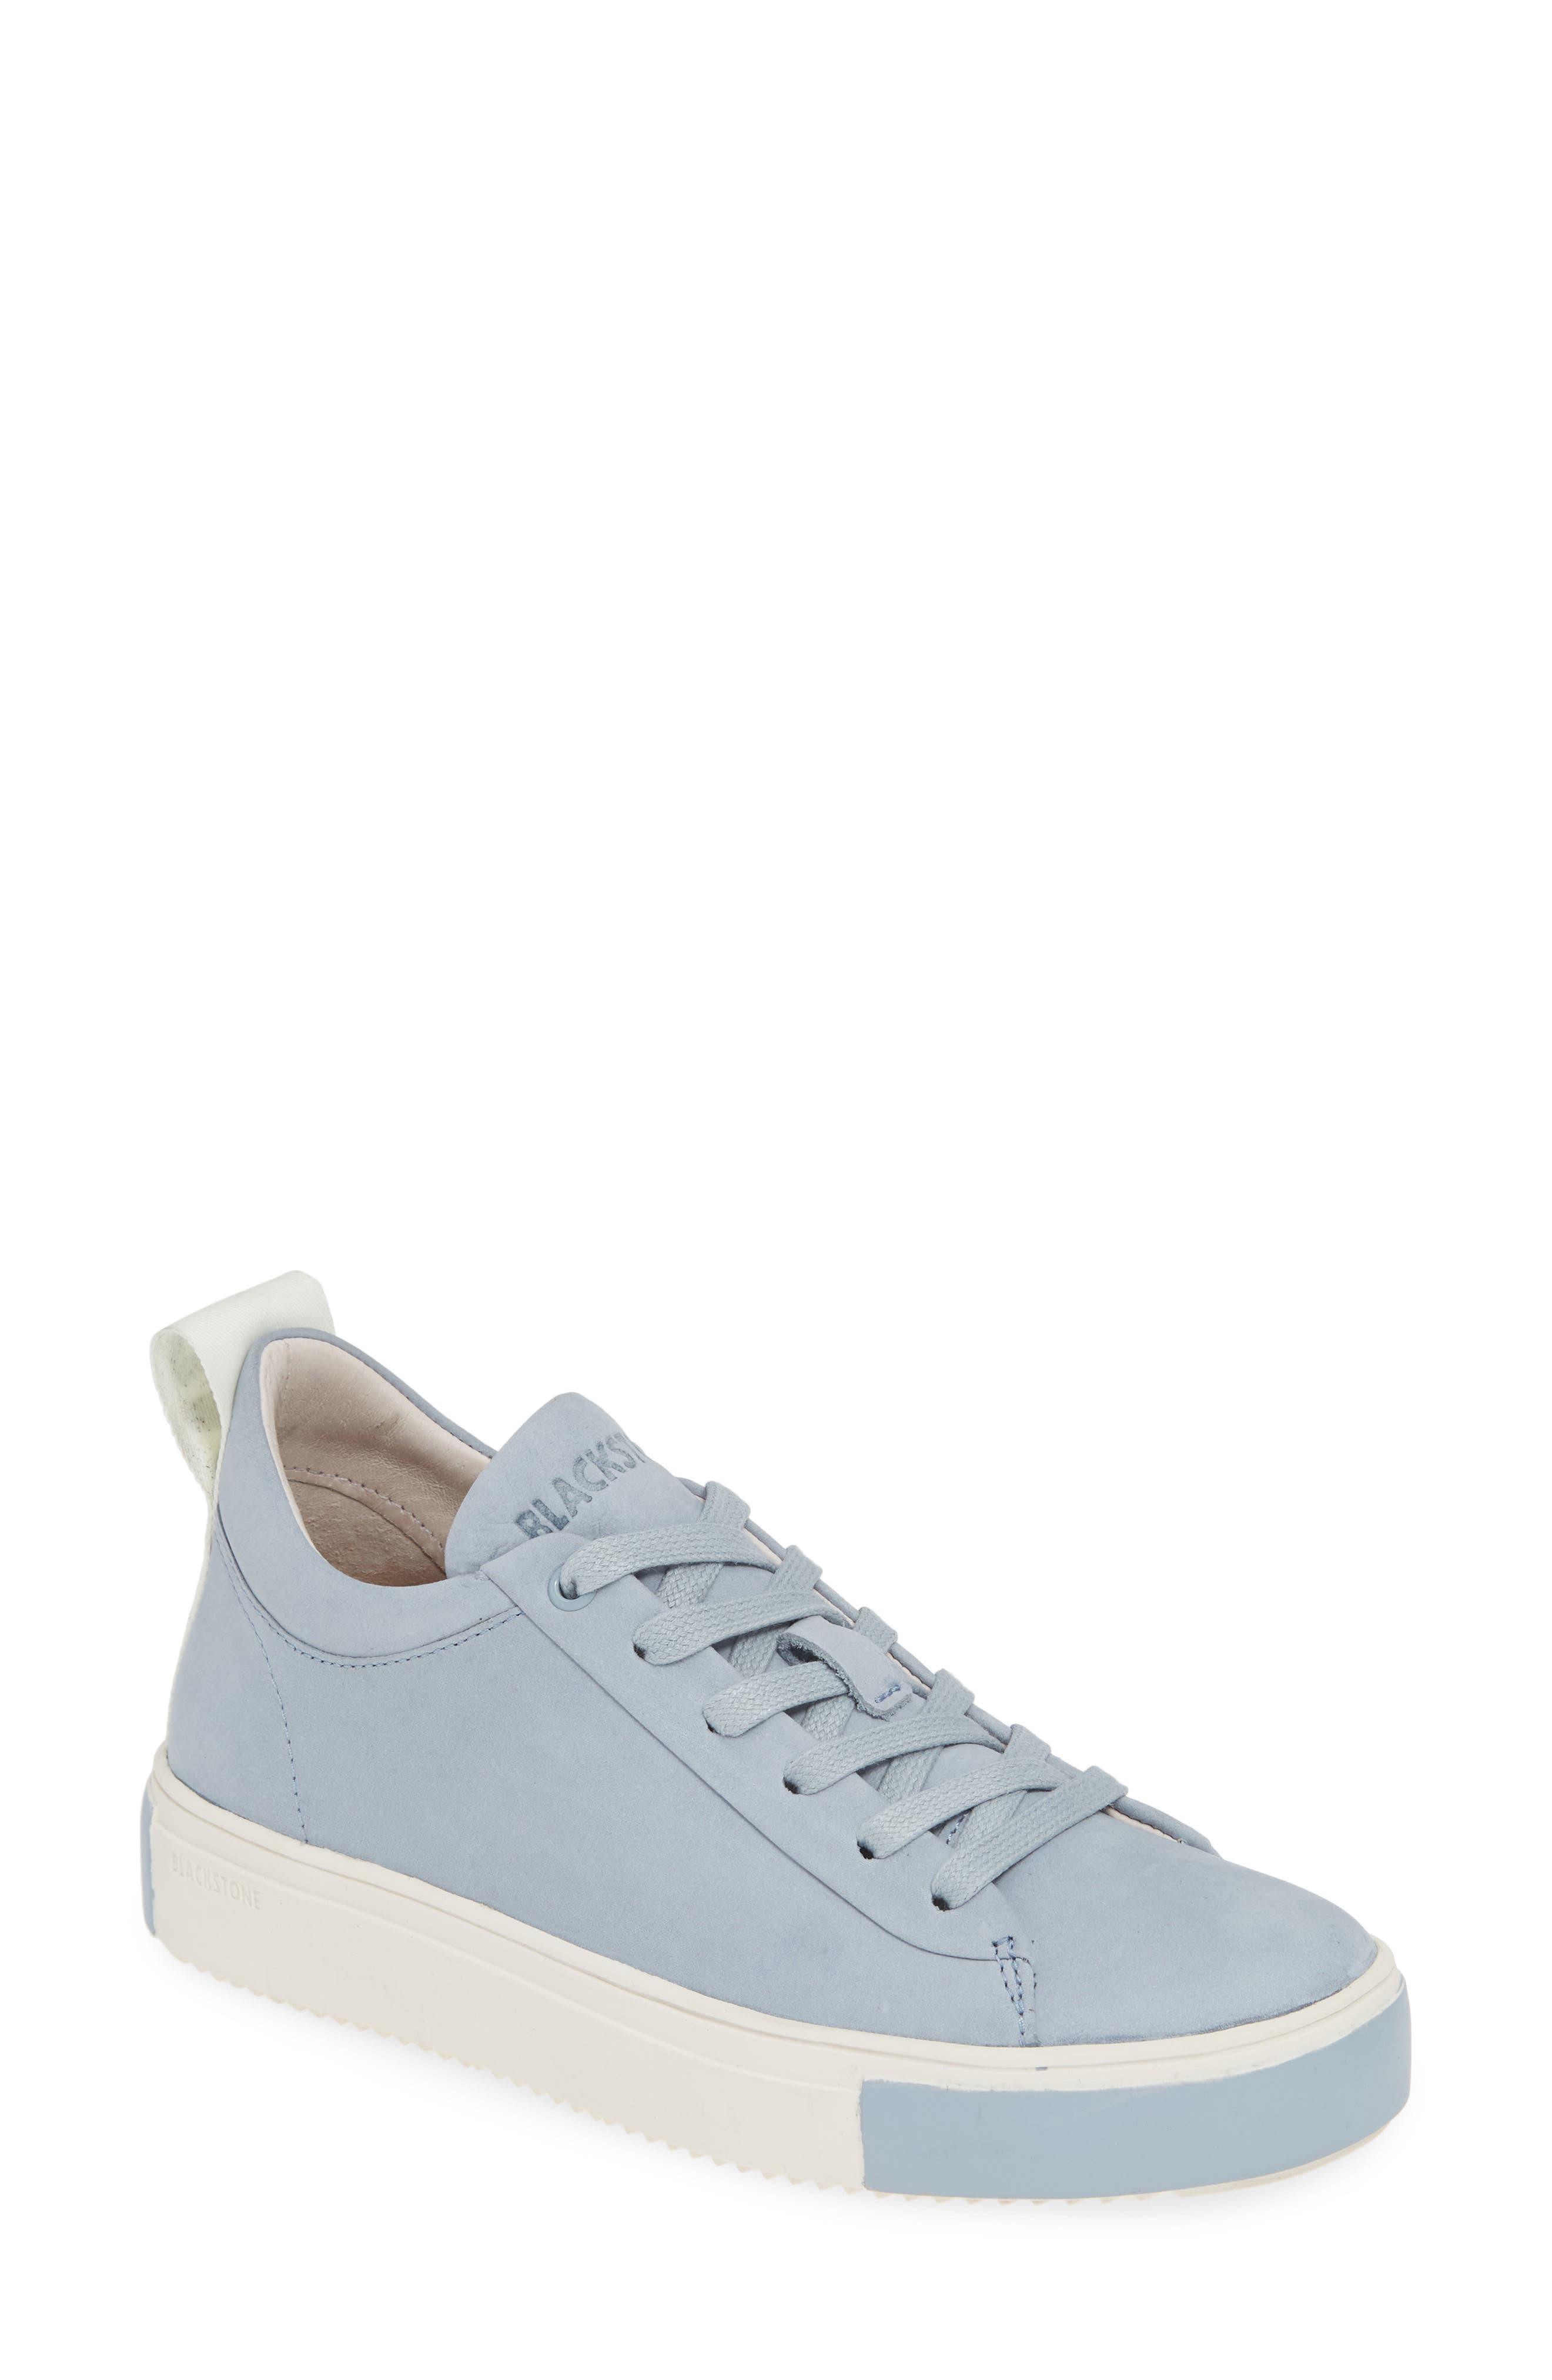 Blackstone Rl65 Mid Top Sneaker, Blue